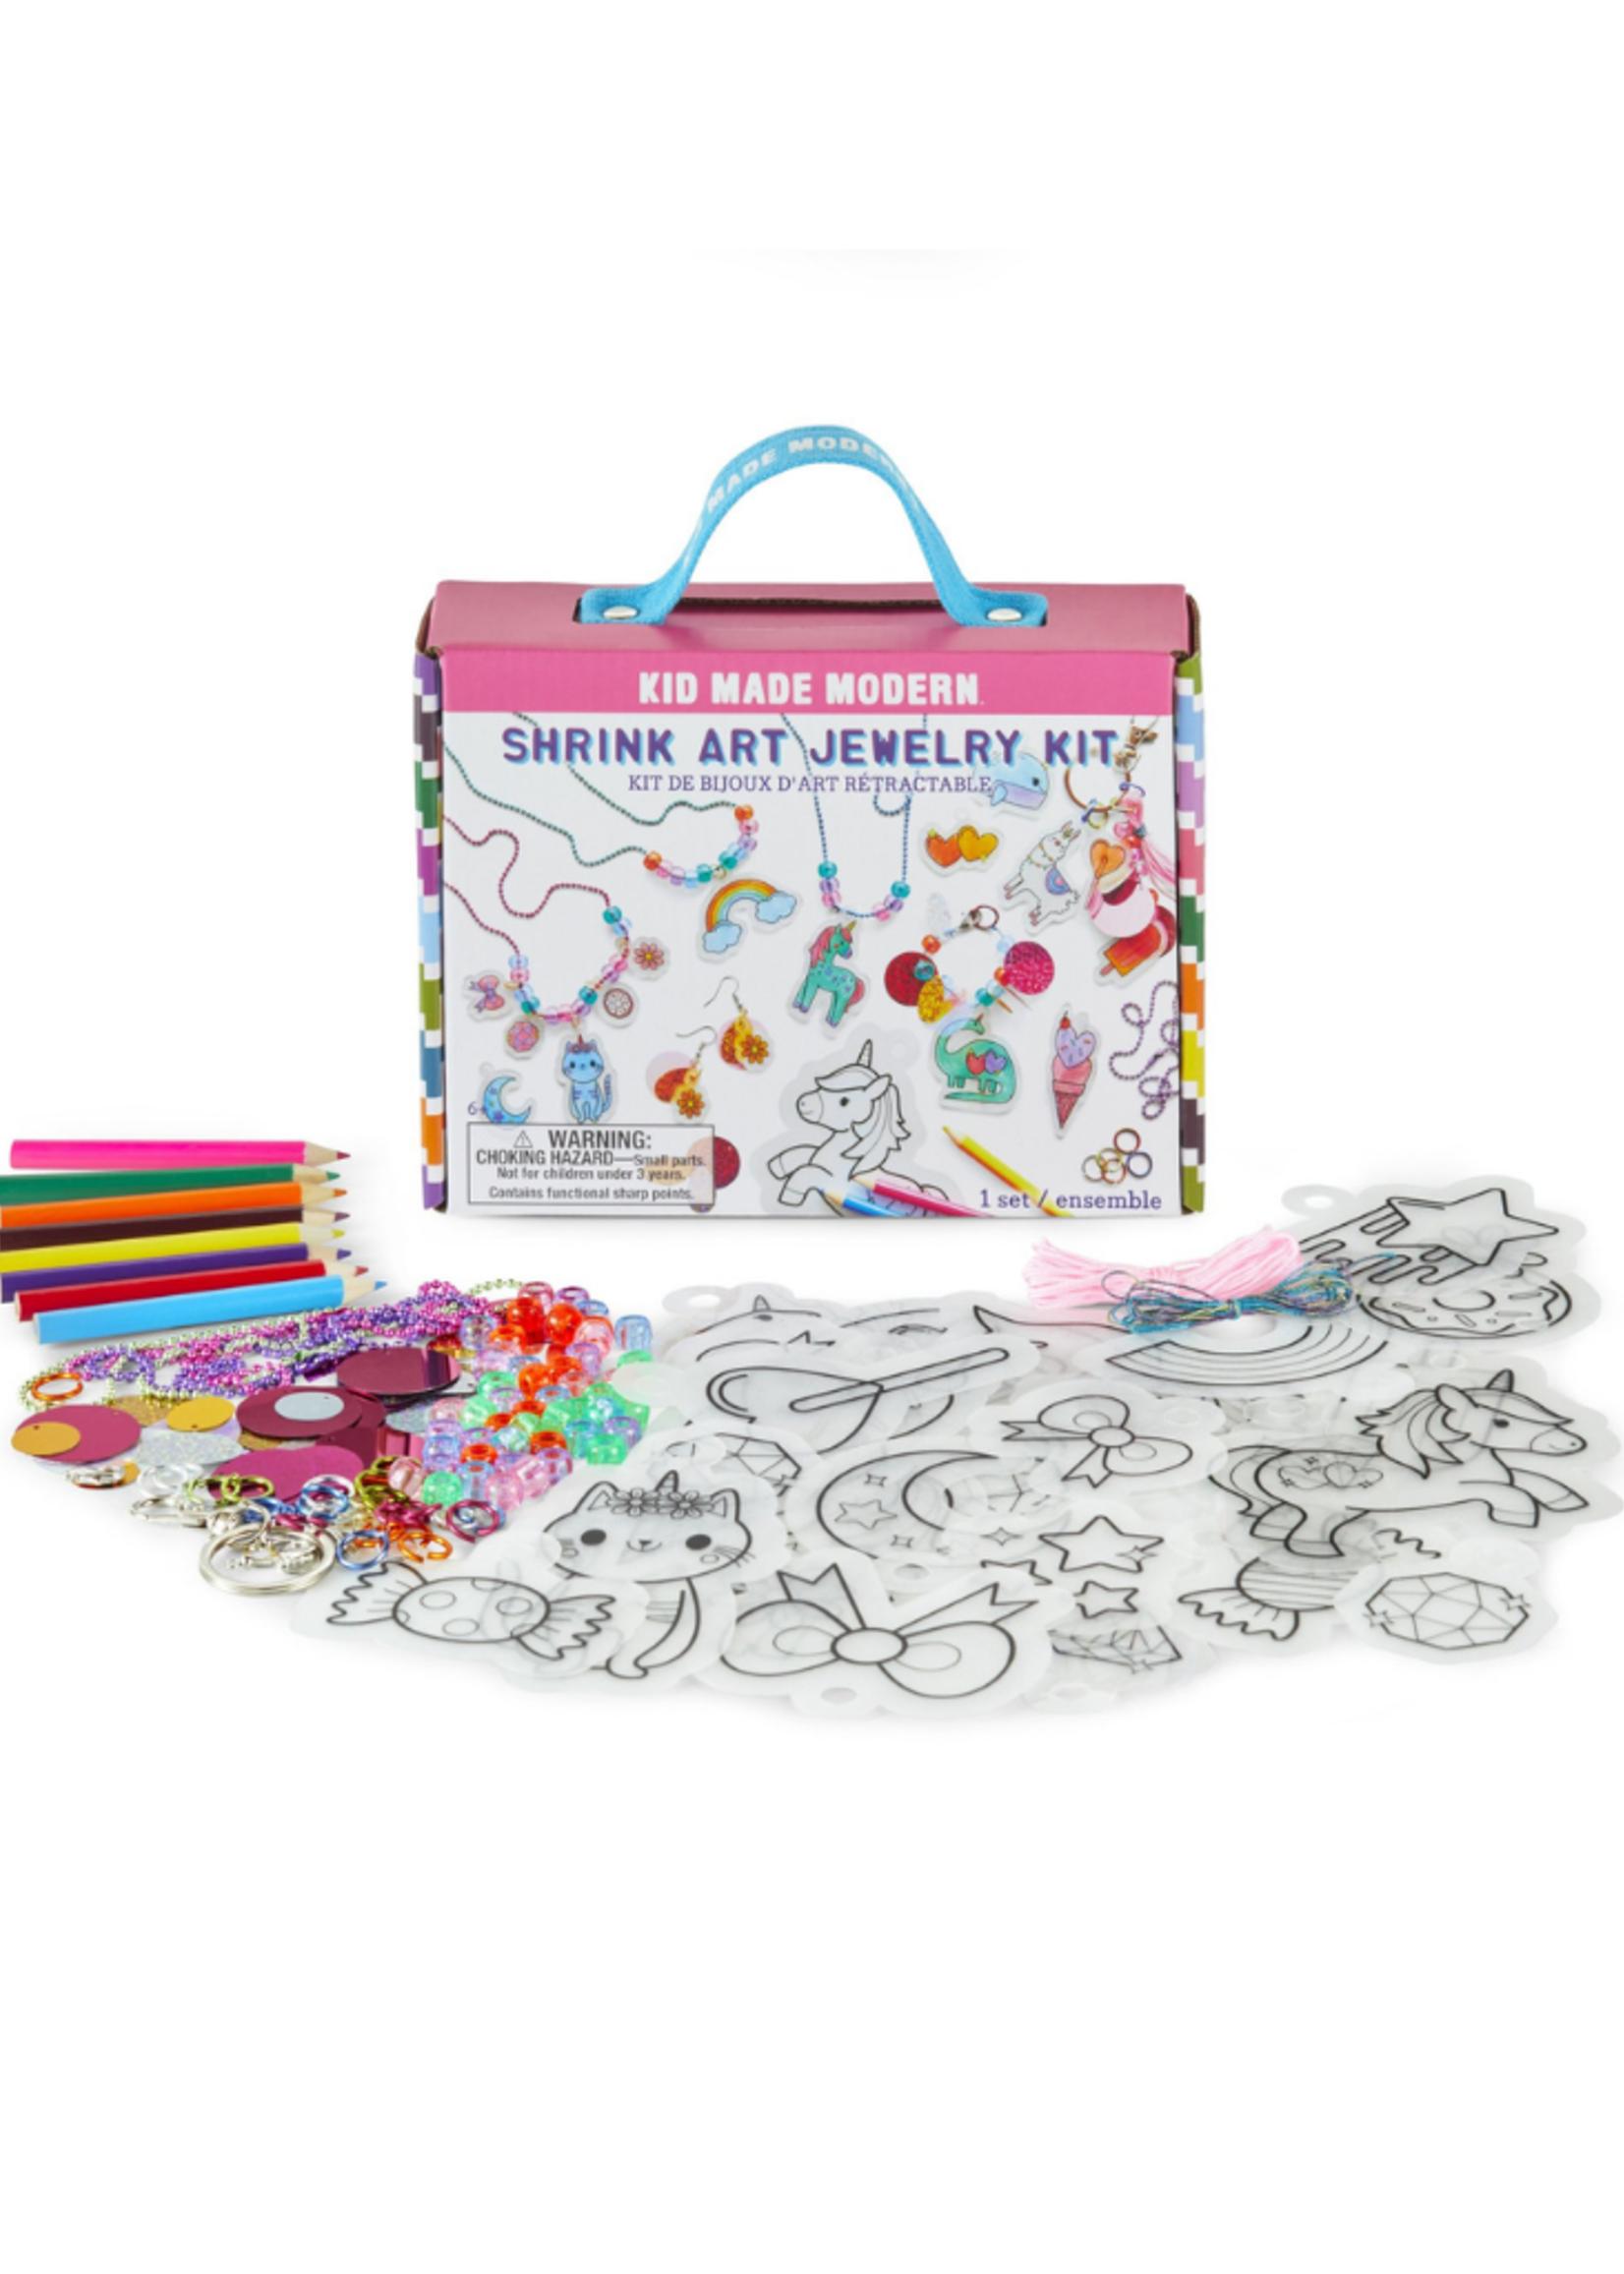 Kids Made Modern Shrink Art Jewelry Kit